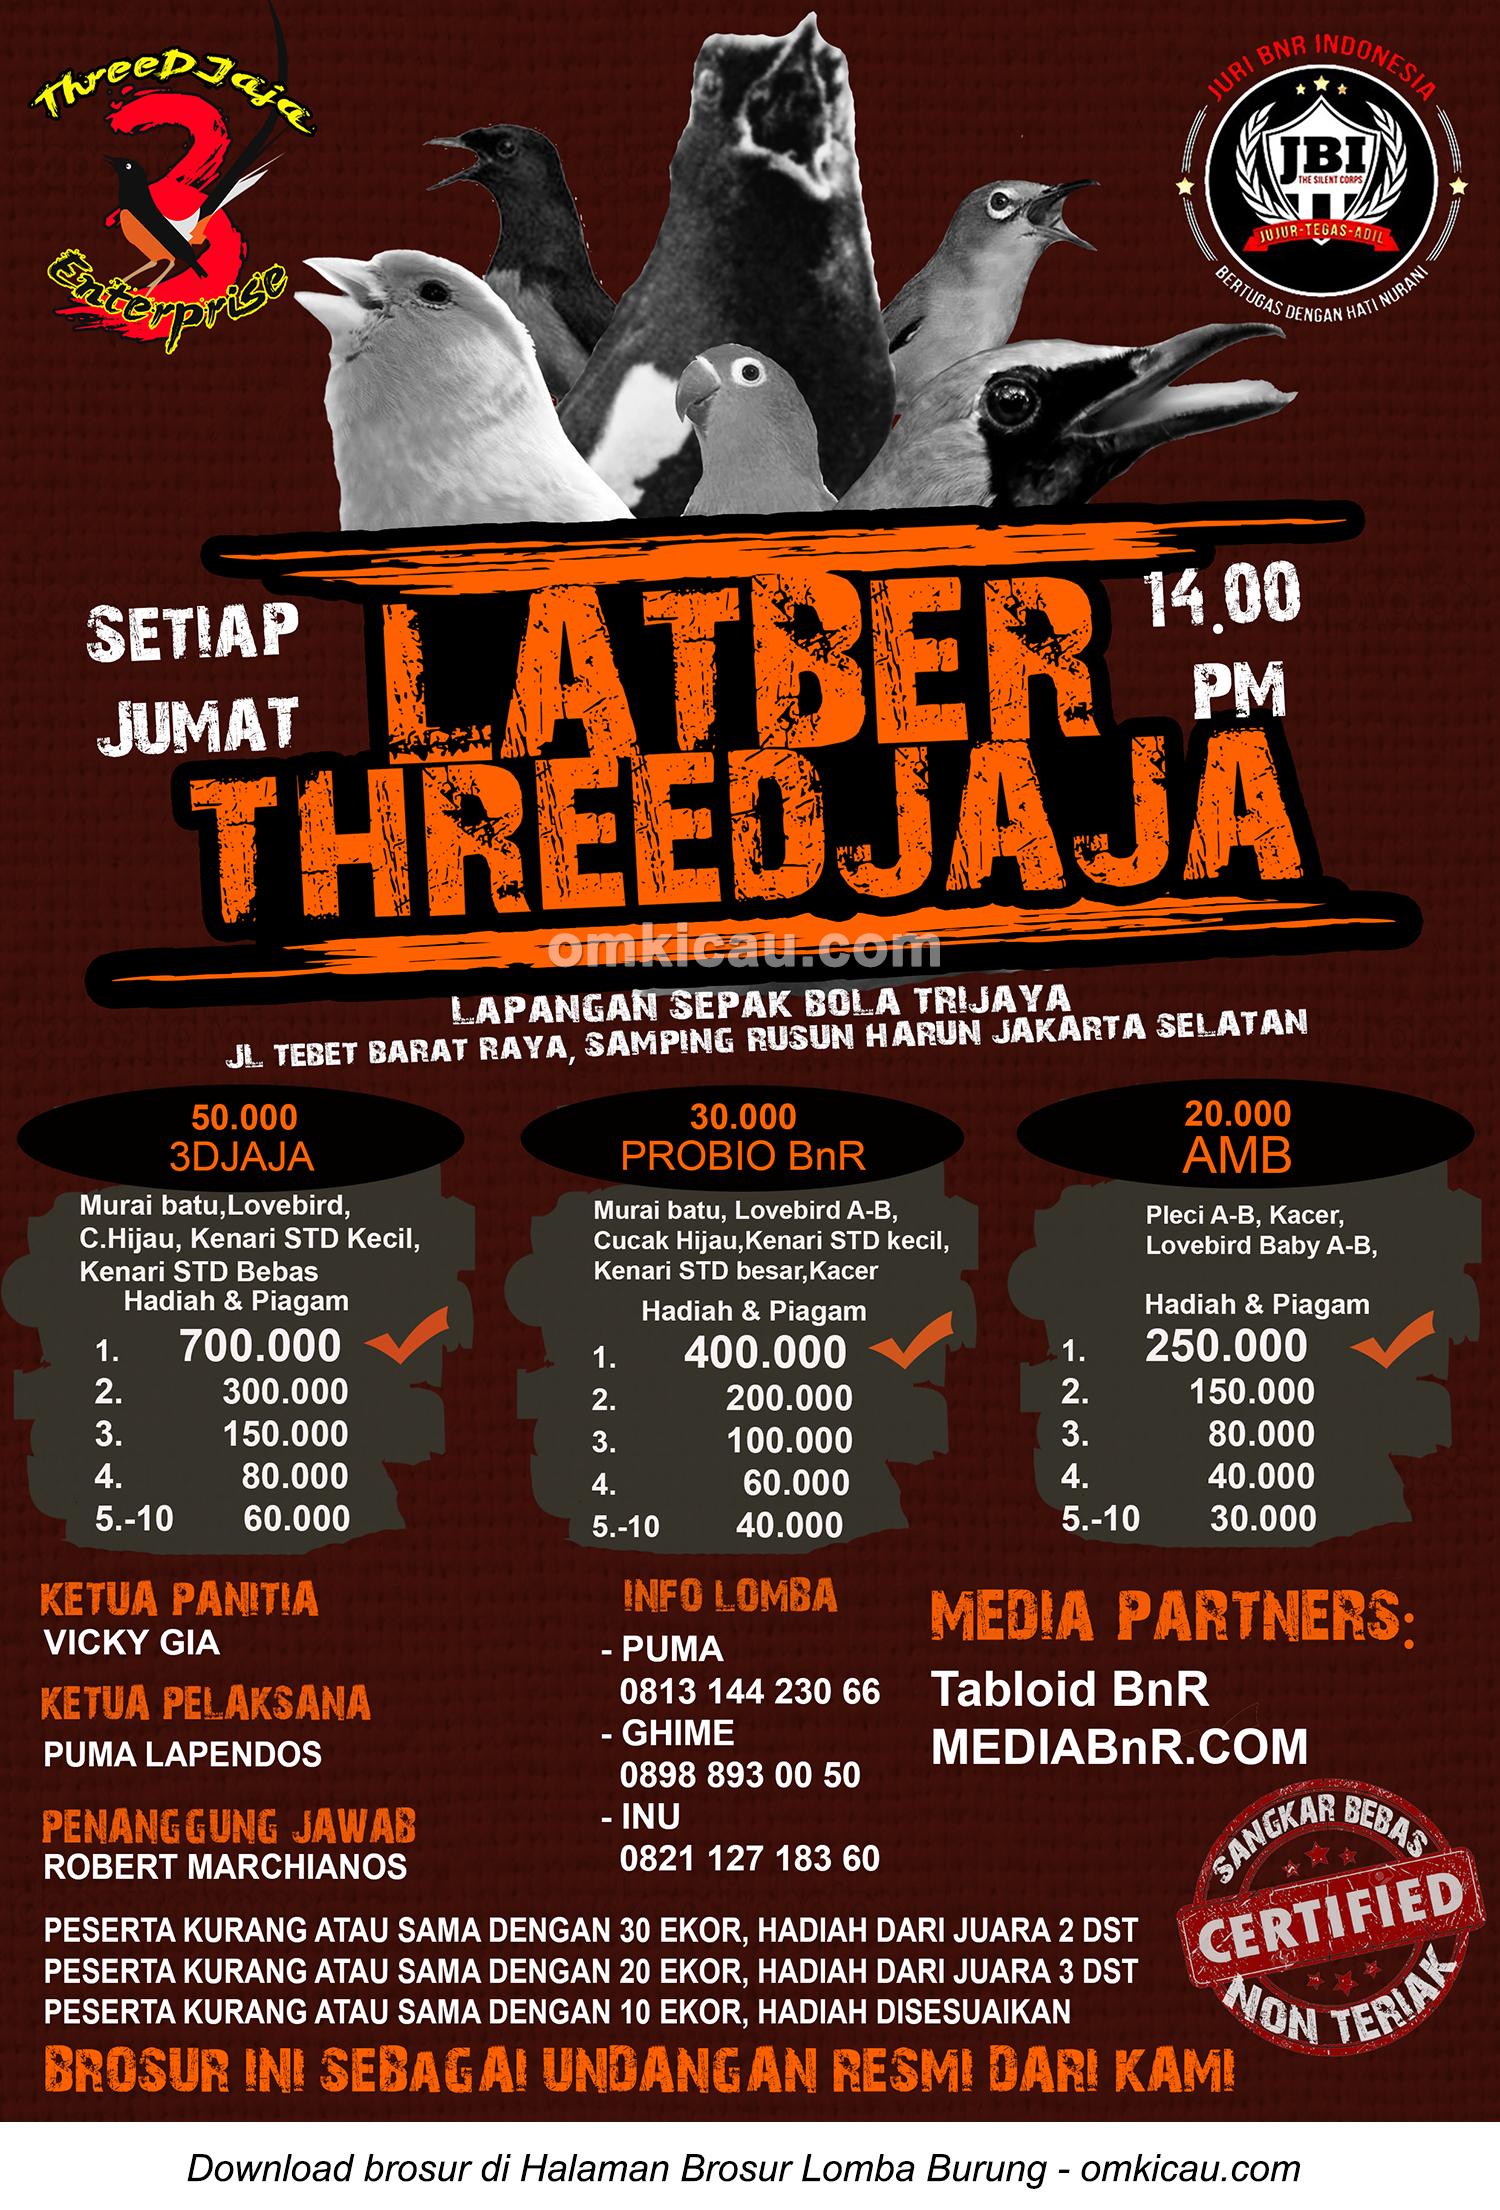 Brosur Latber ThreeDjaja Jakarta setiap Jumat siang